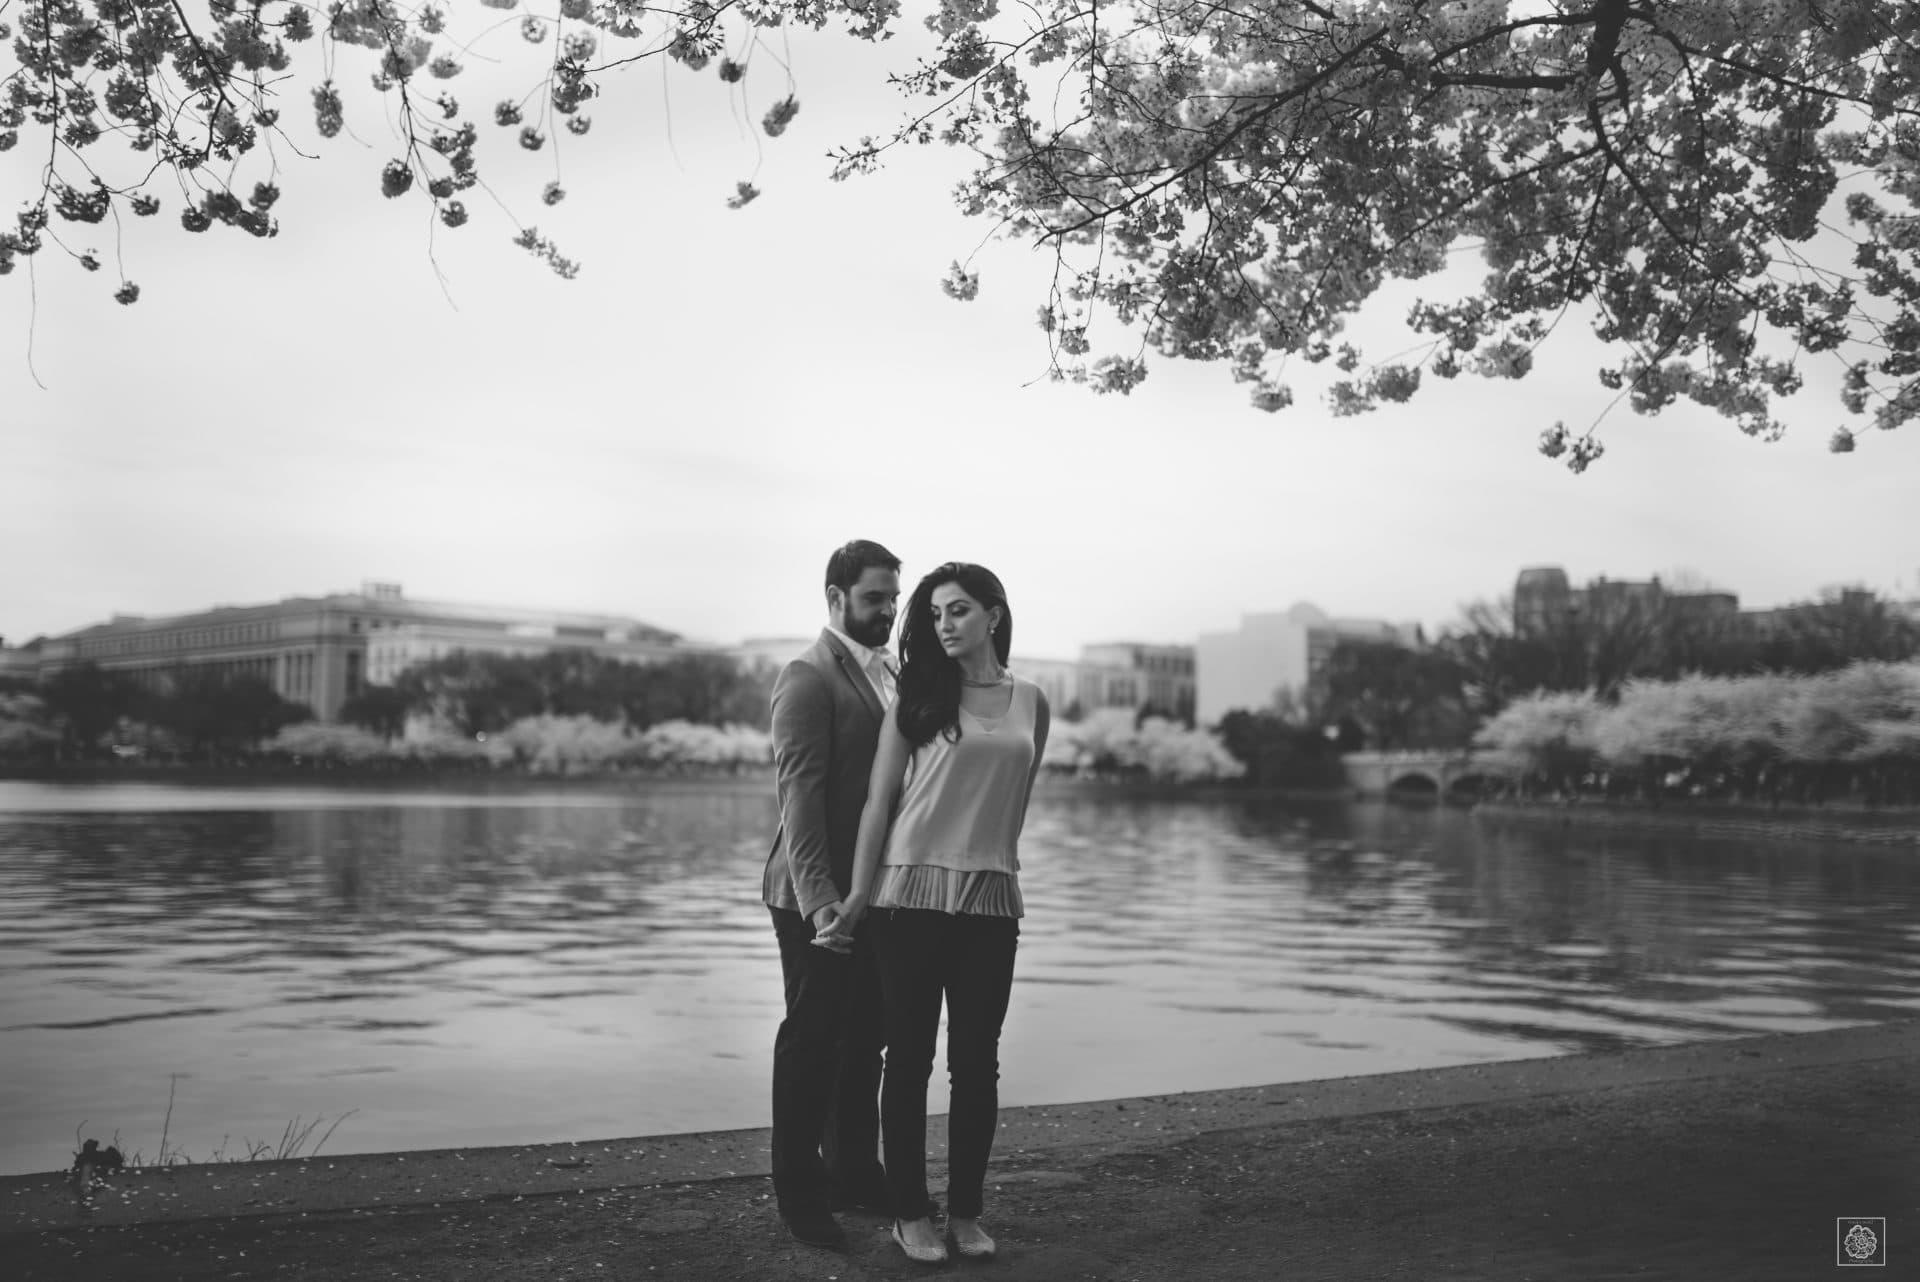 Tidal Basin - Cherry Blossom - Spring - Engagement Session